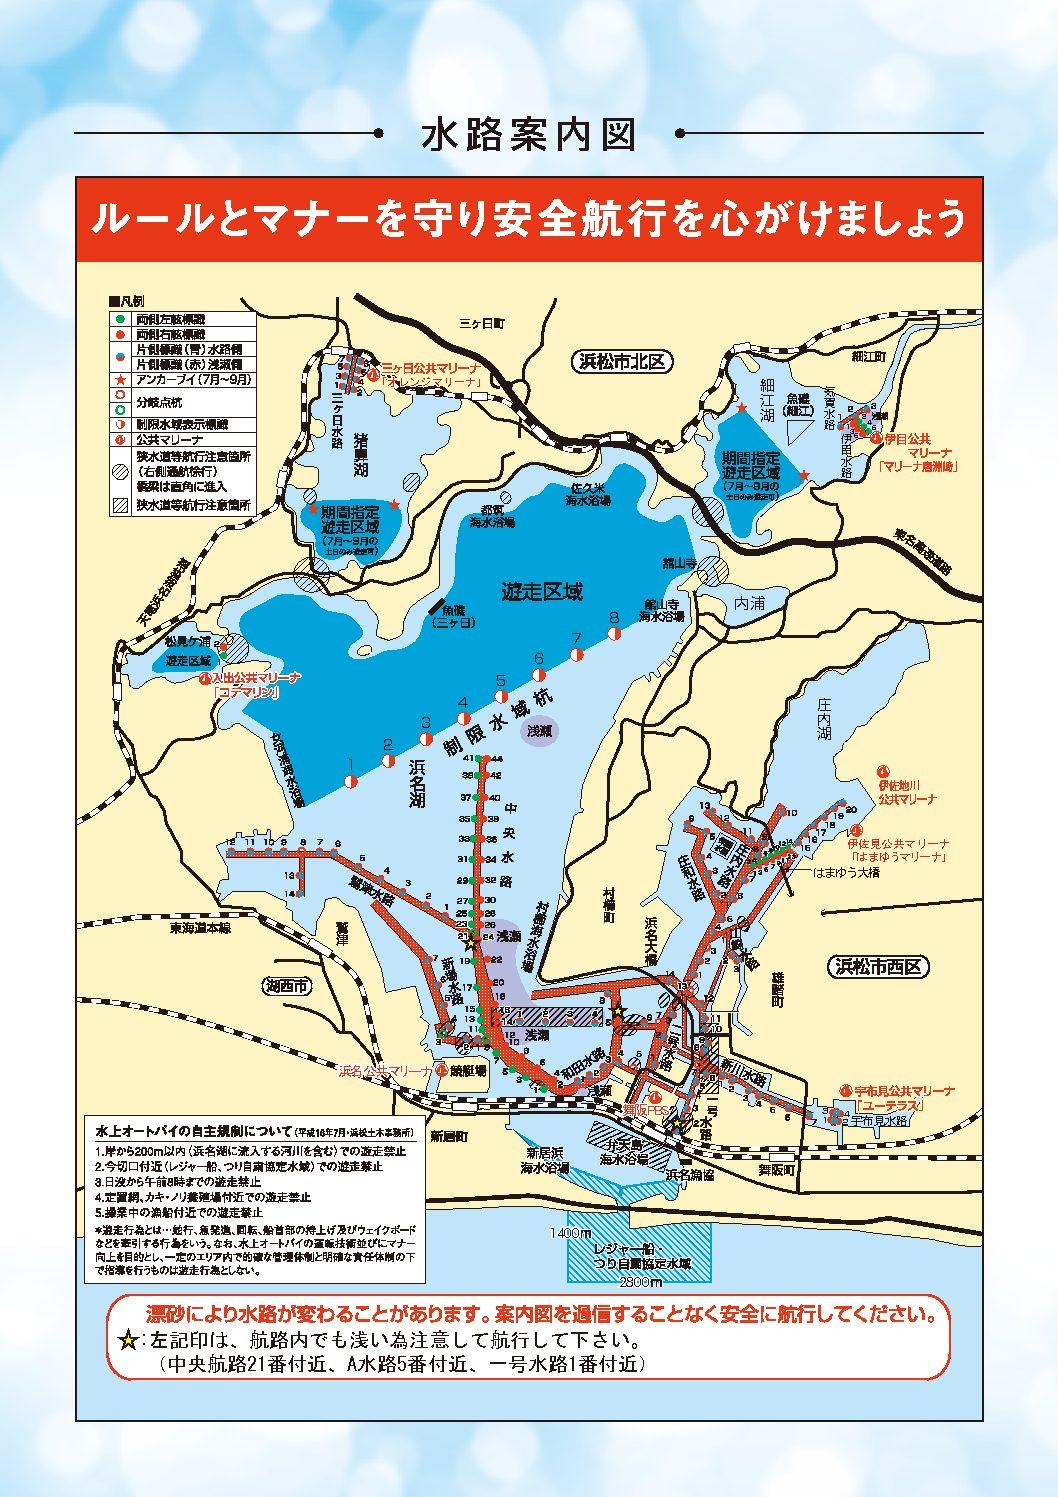 浜名湖の水路案内図